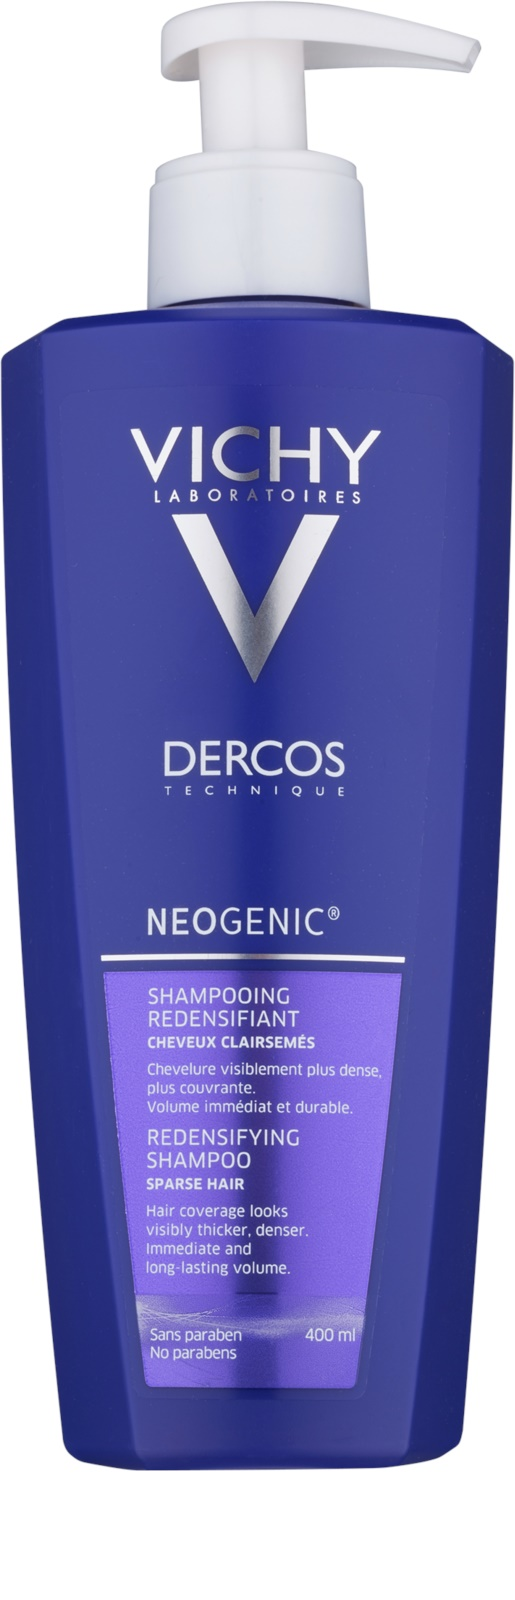 vichy-dercos-neogenic-sampon-obnovujici-hustotu-vlasu___19